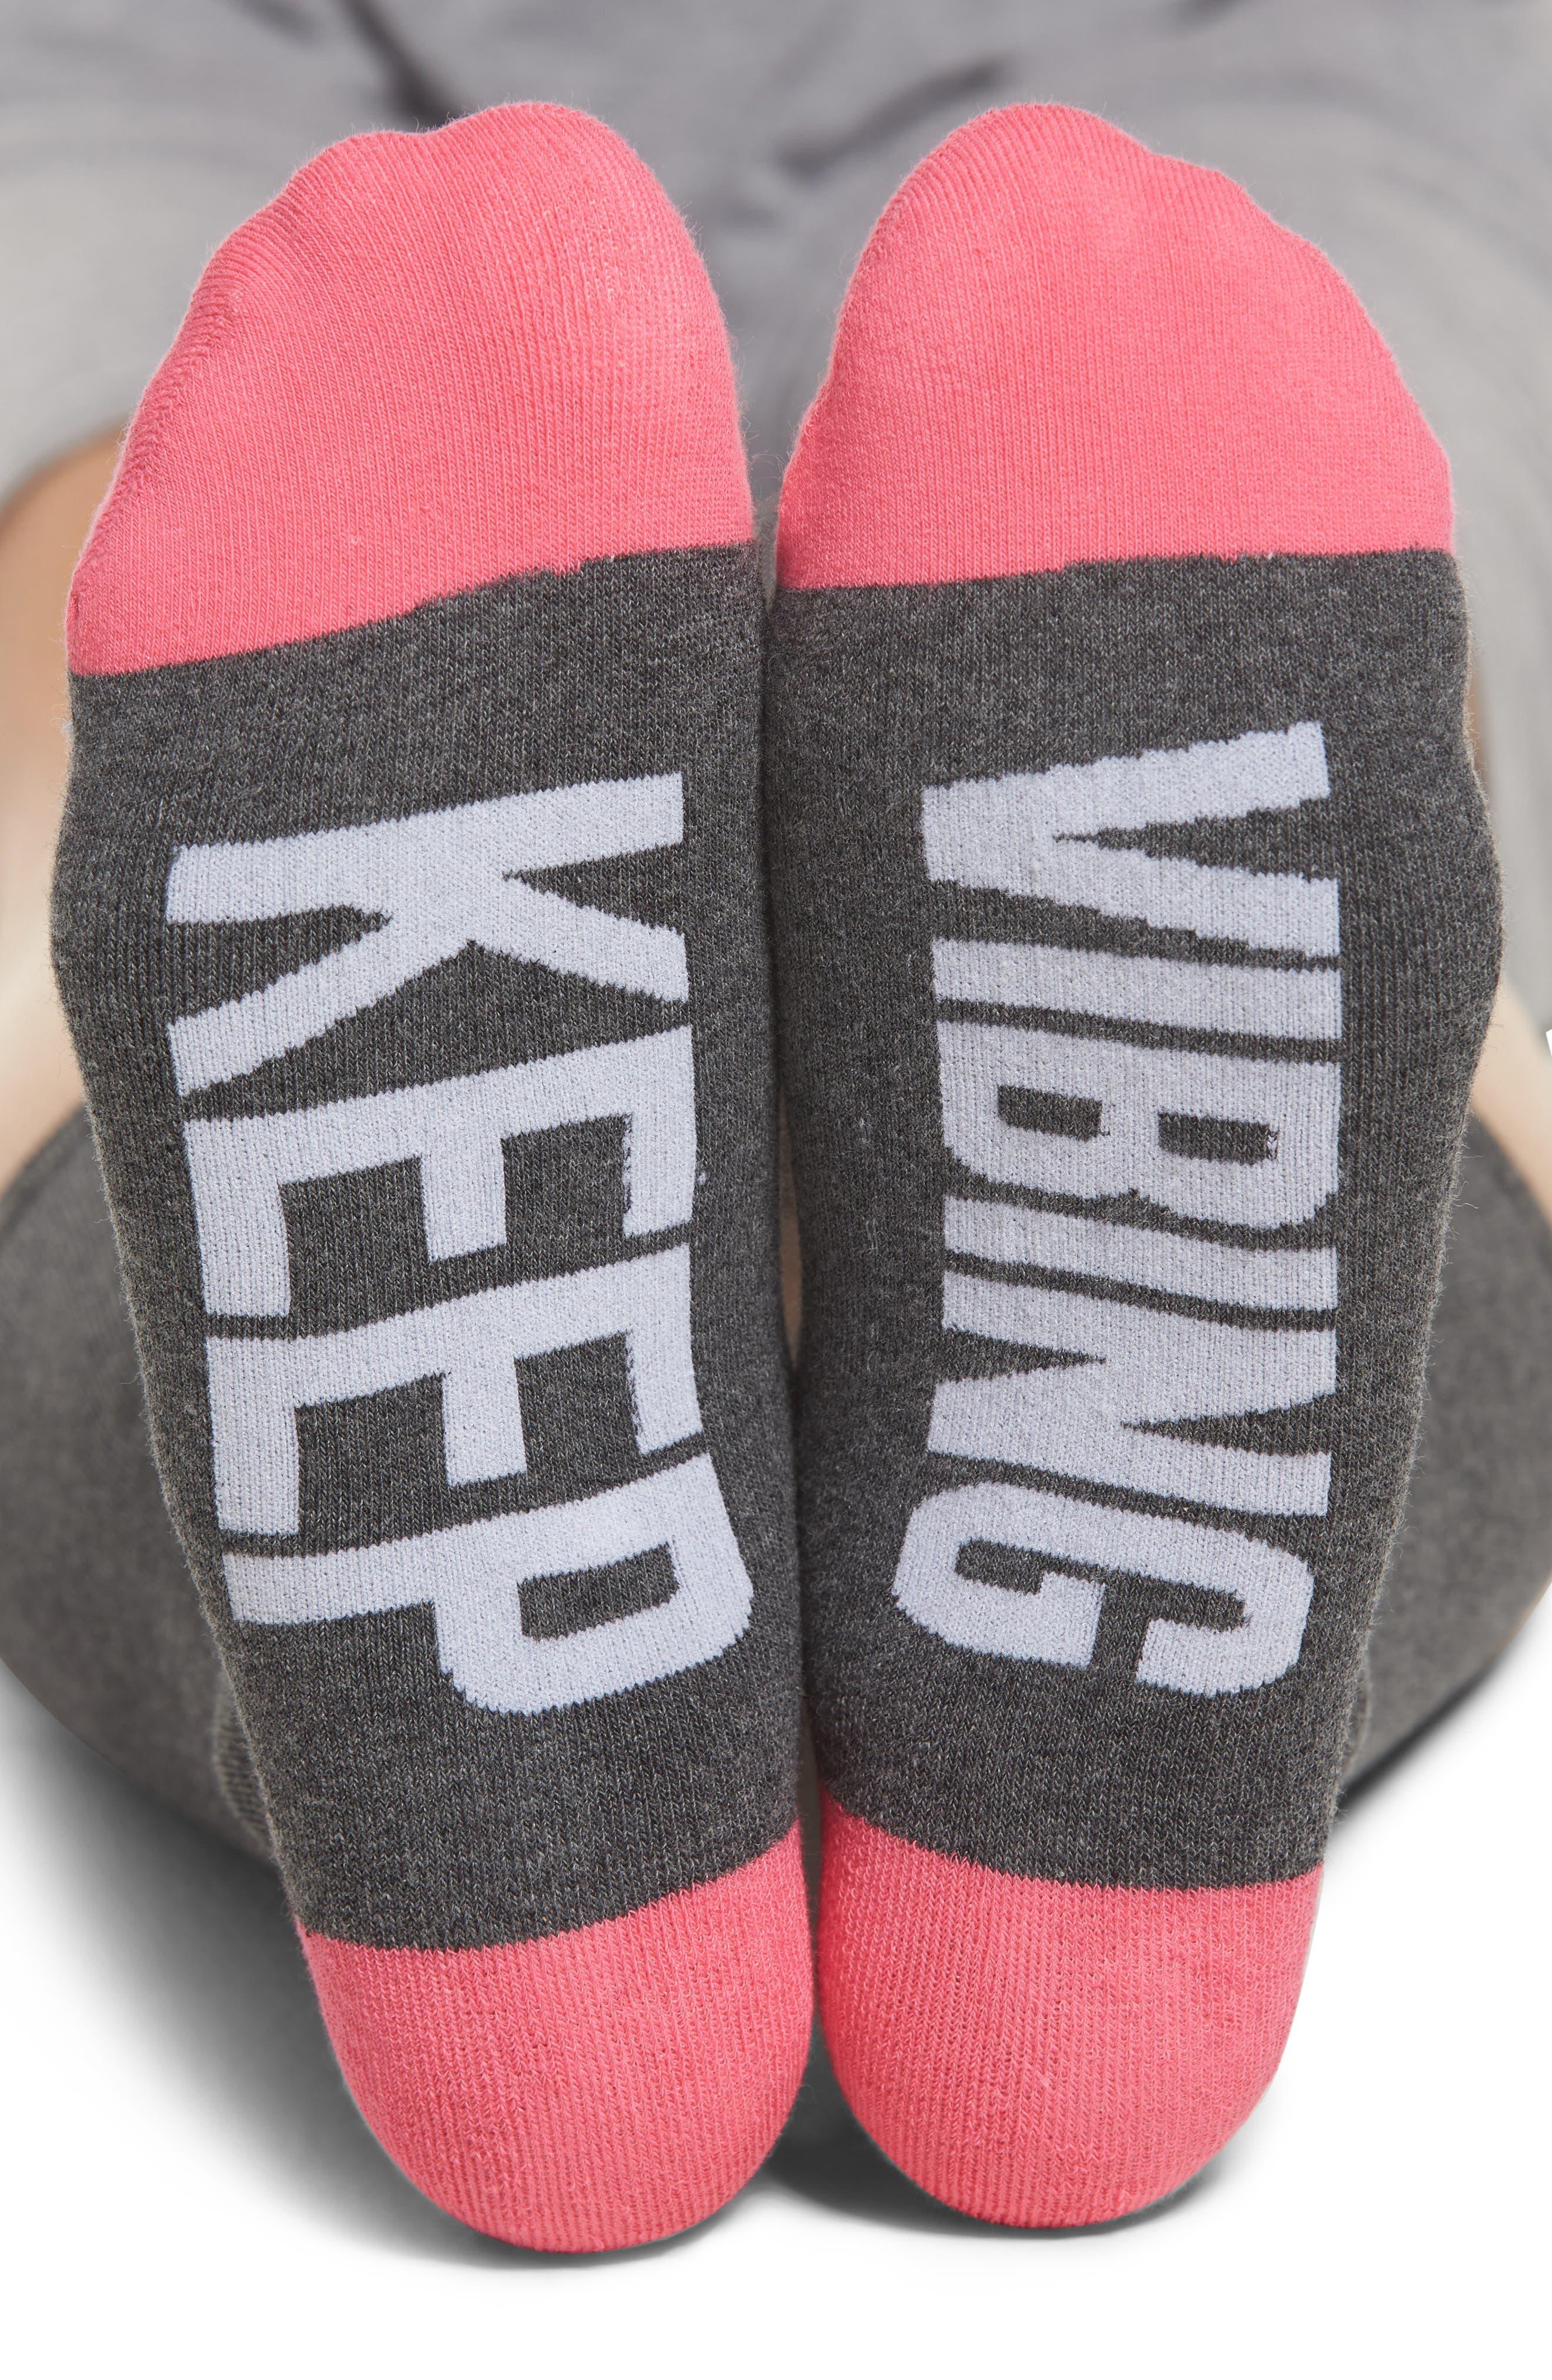 Main Image - SOCKART Keep Vibing Crew Socks